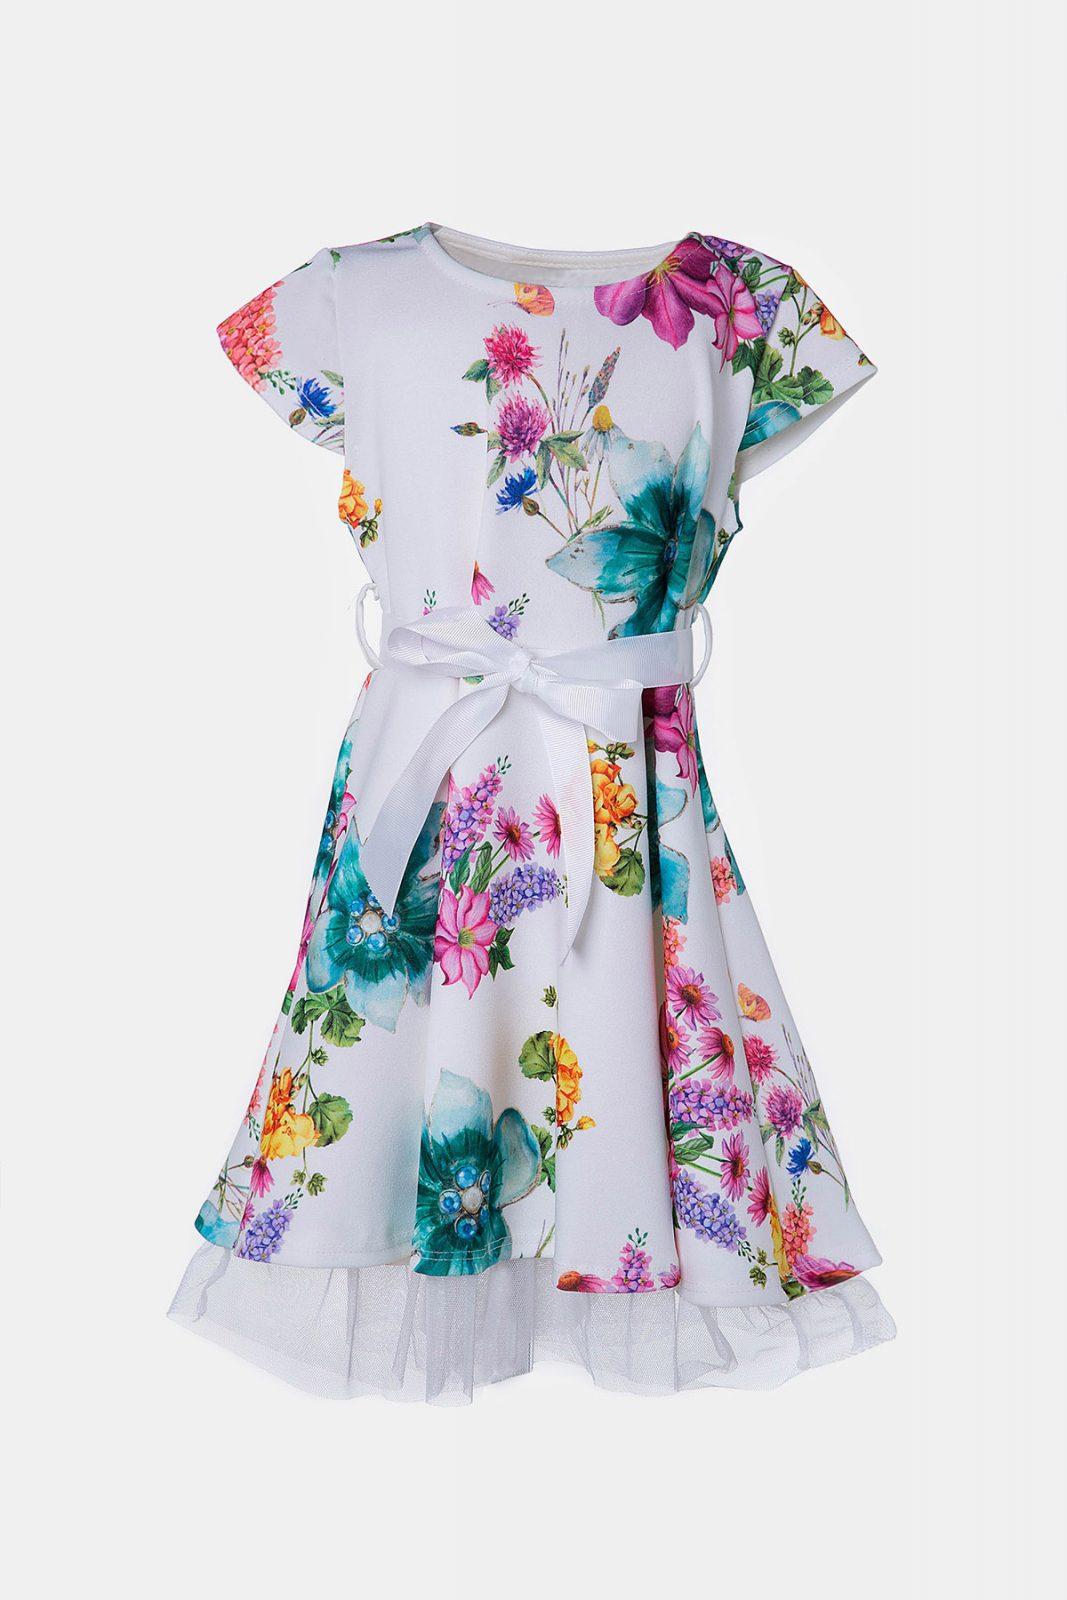 36a45ecc387 Φλοράλ φόρεμα για κορίτσια με πολύχρωμα λουλούδια και λευκή ζώνη